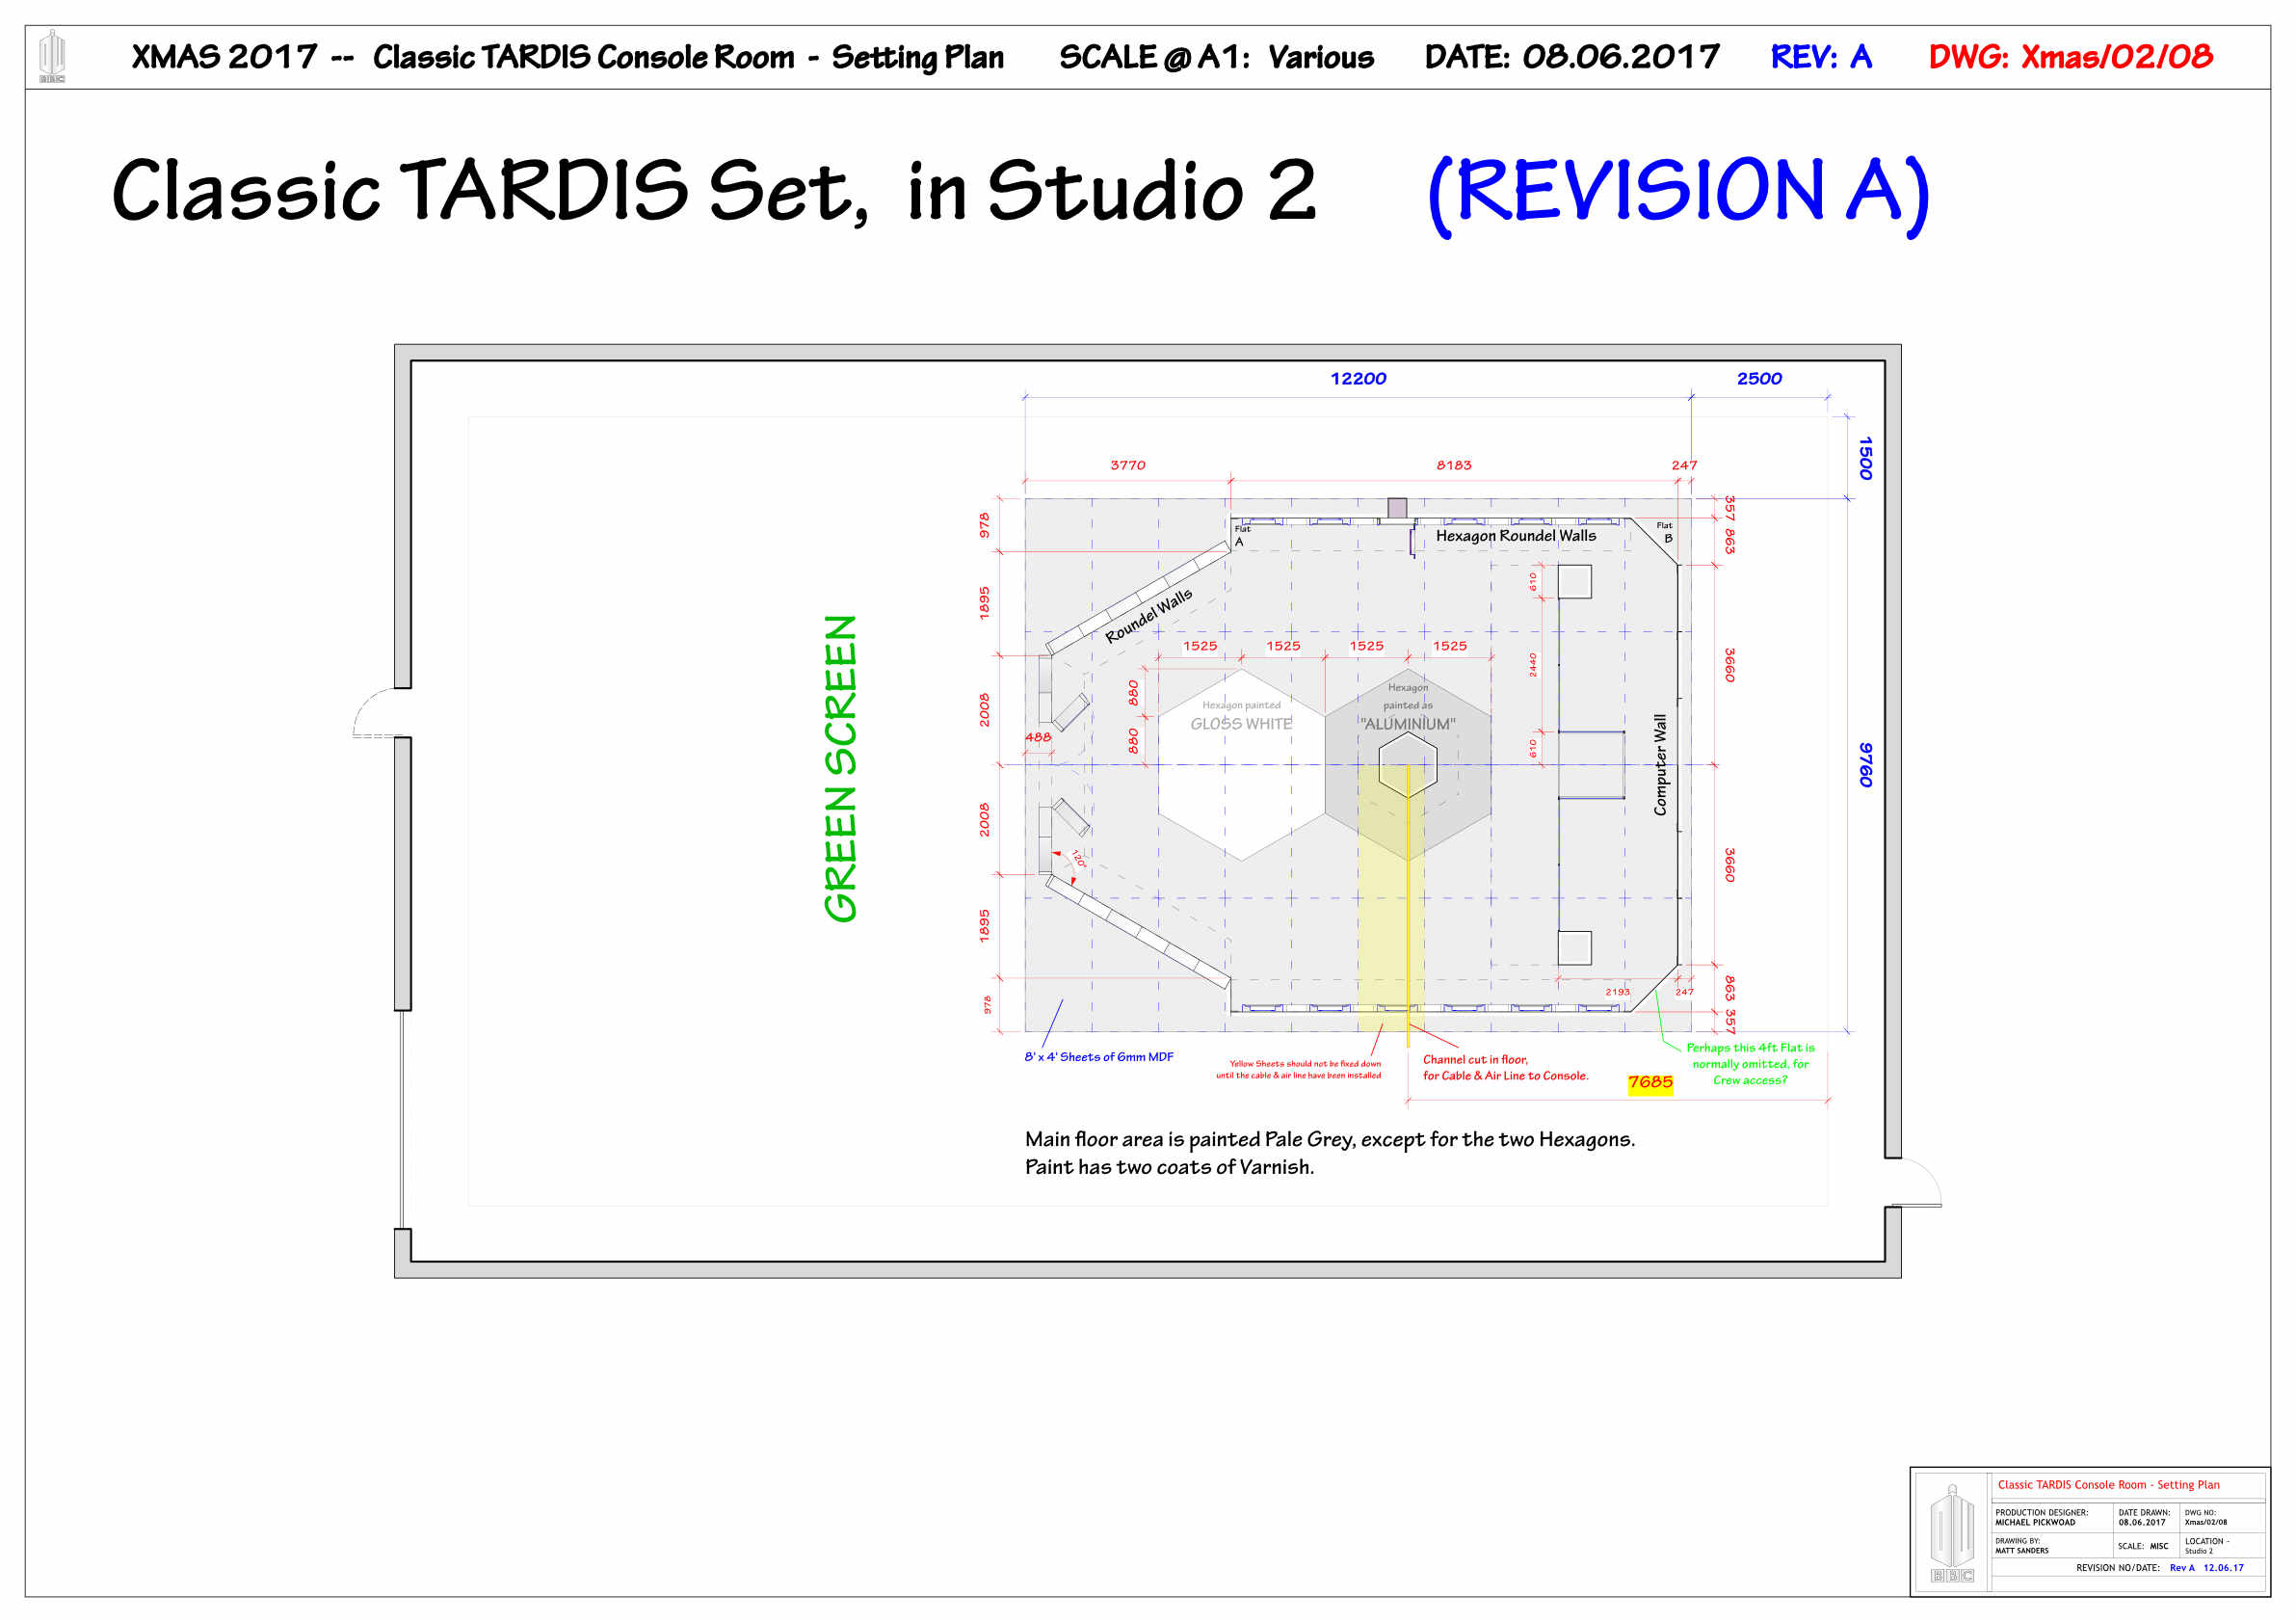 Xmas:02:08-RevA-ClassicTARDIS-SettingPlan.jpg